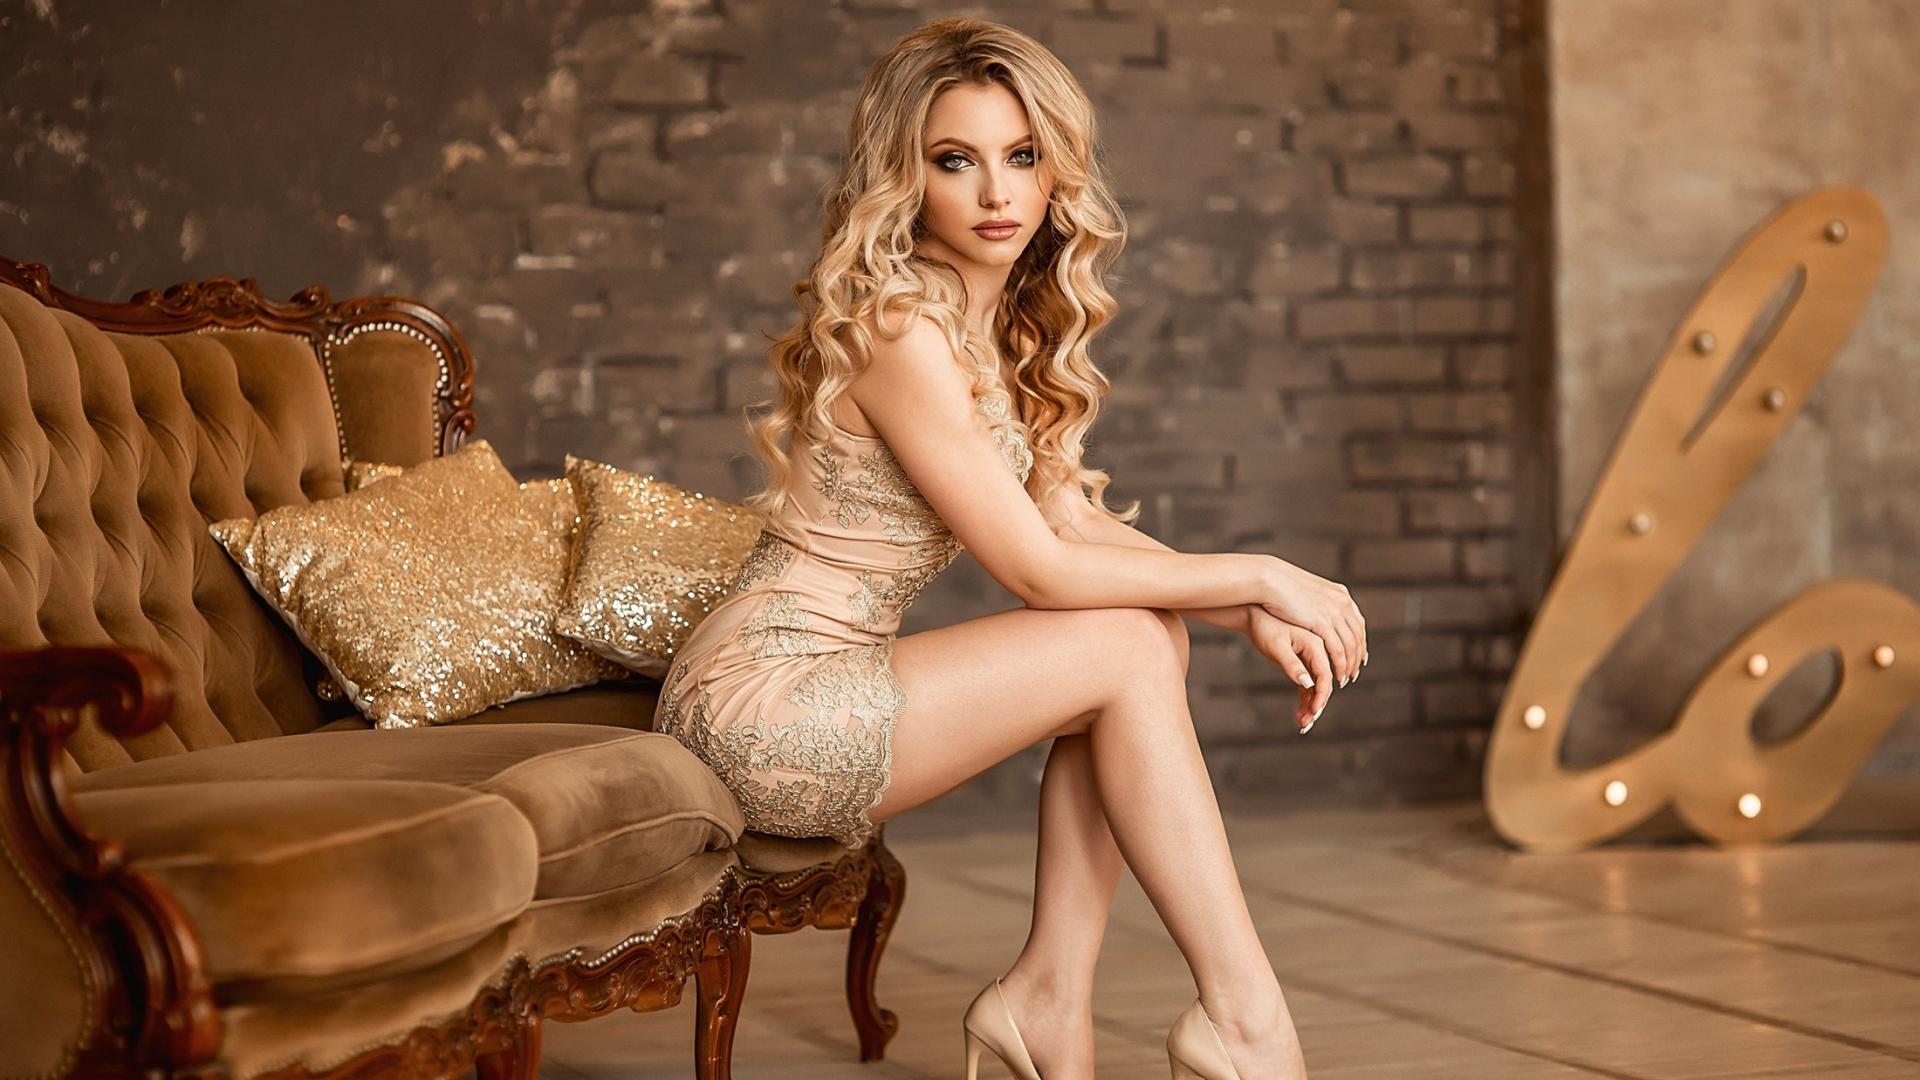 Download 1920x1080 Wallpaper Ekaterina Zorina Sit Sofa Hot